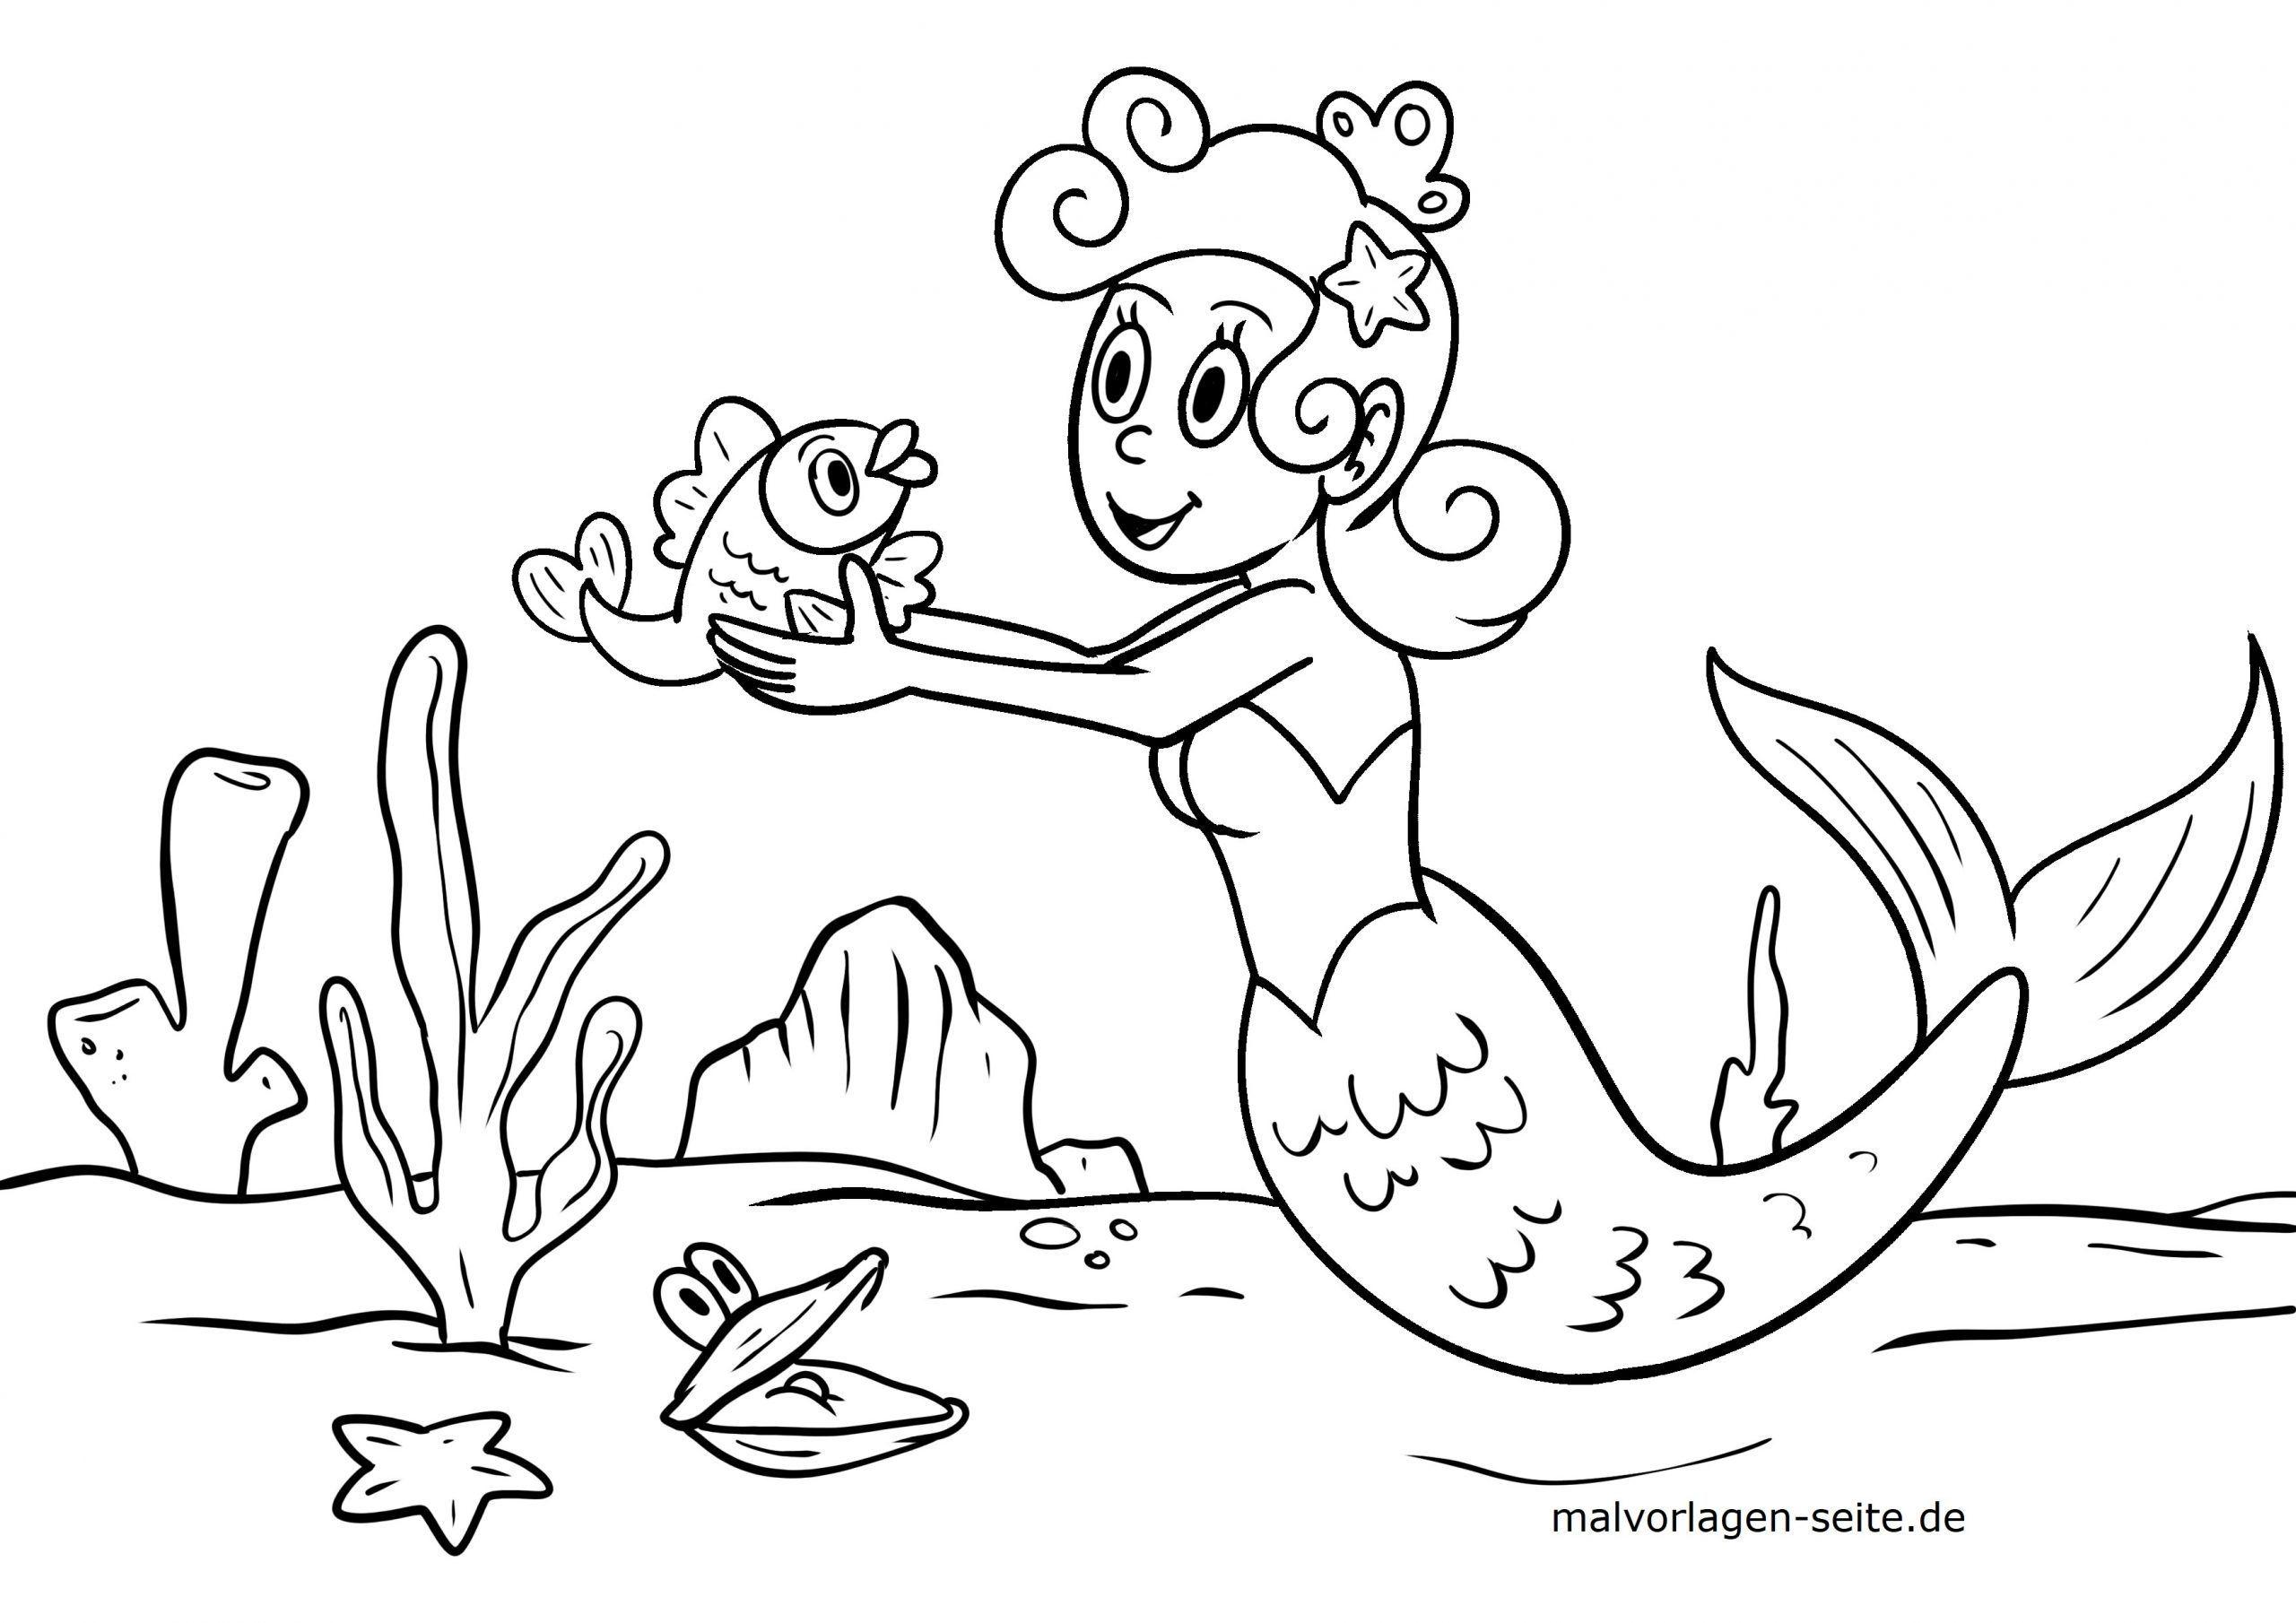 Malvorlagen Meerjungfrau